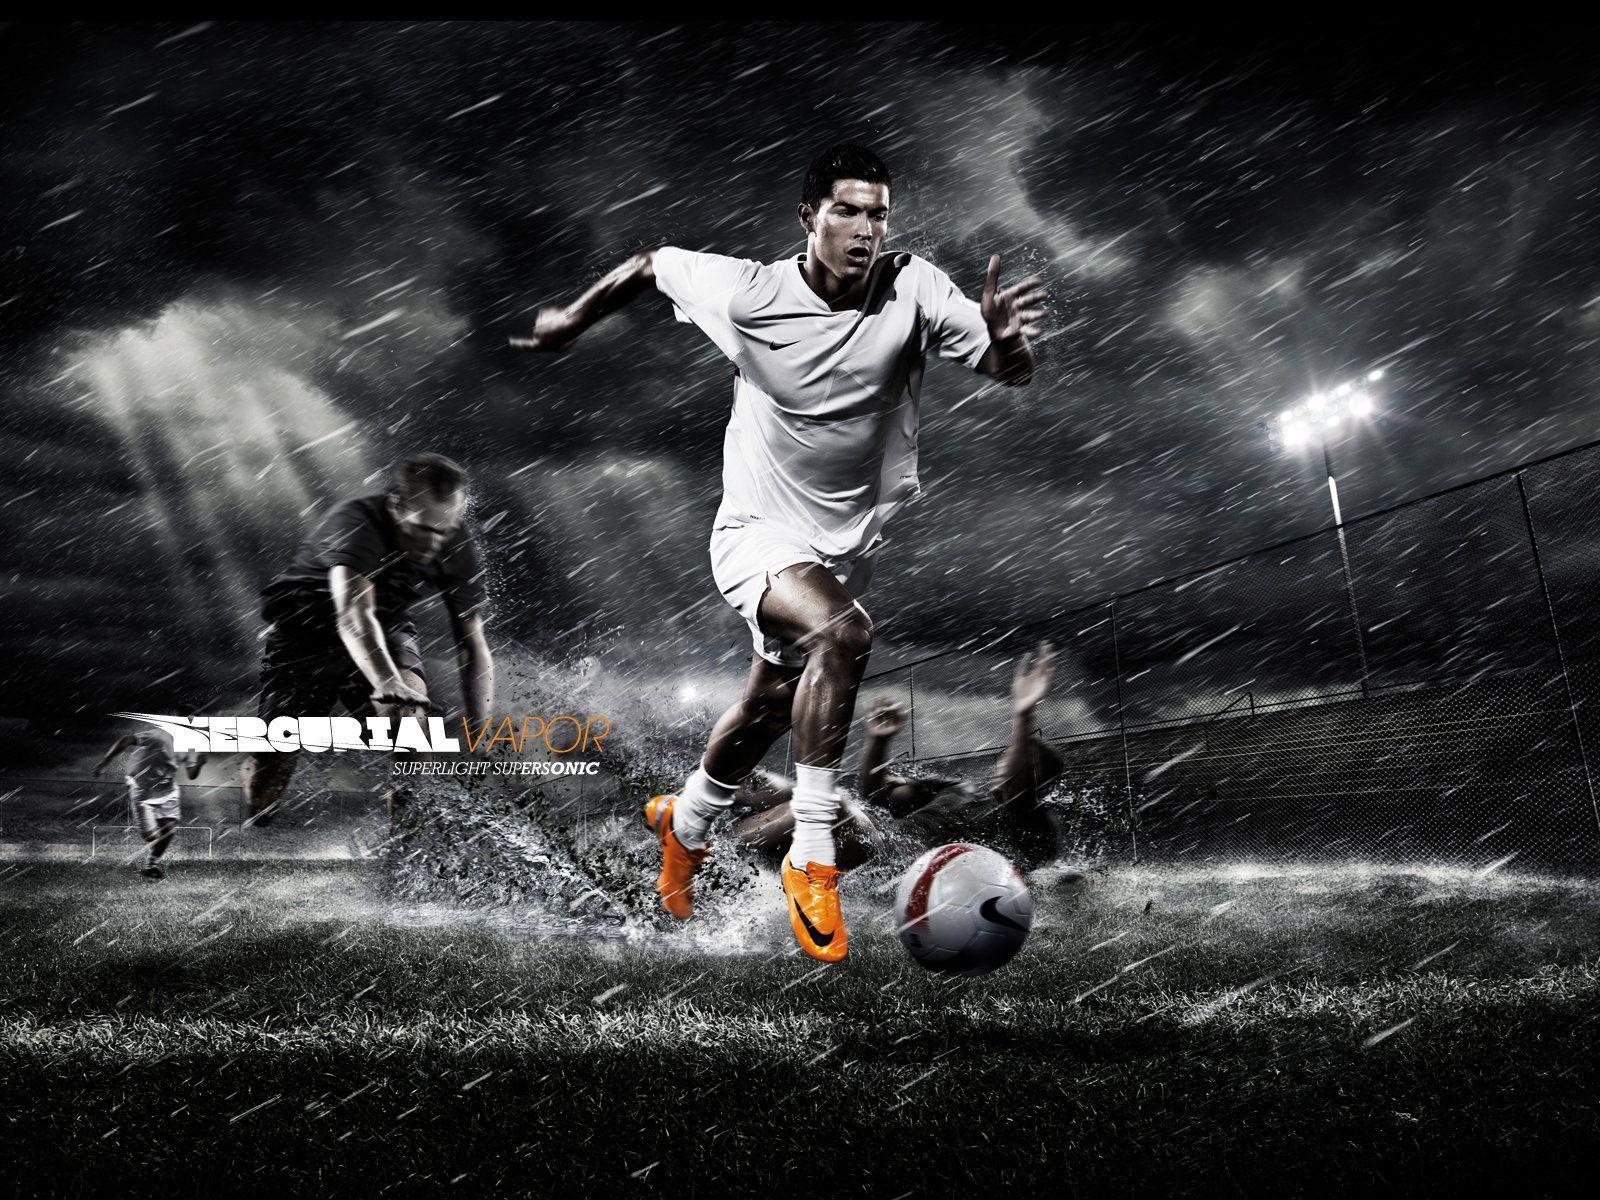 Football Boots 137 Sports Products Brand Nike Free Jpg 1600 1200 Nike Football Cristiano Ronaldo Wallpapers Cristiano Ronaldo Hd Wallpapers